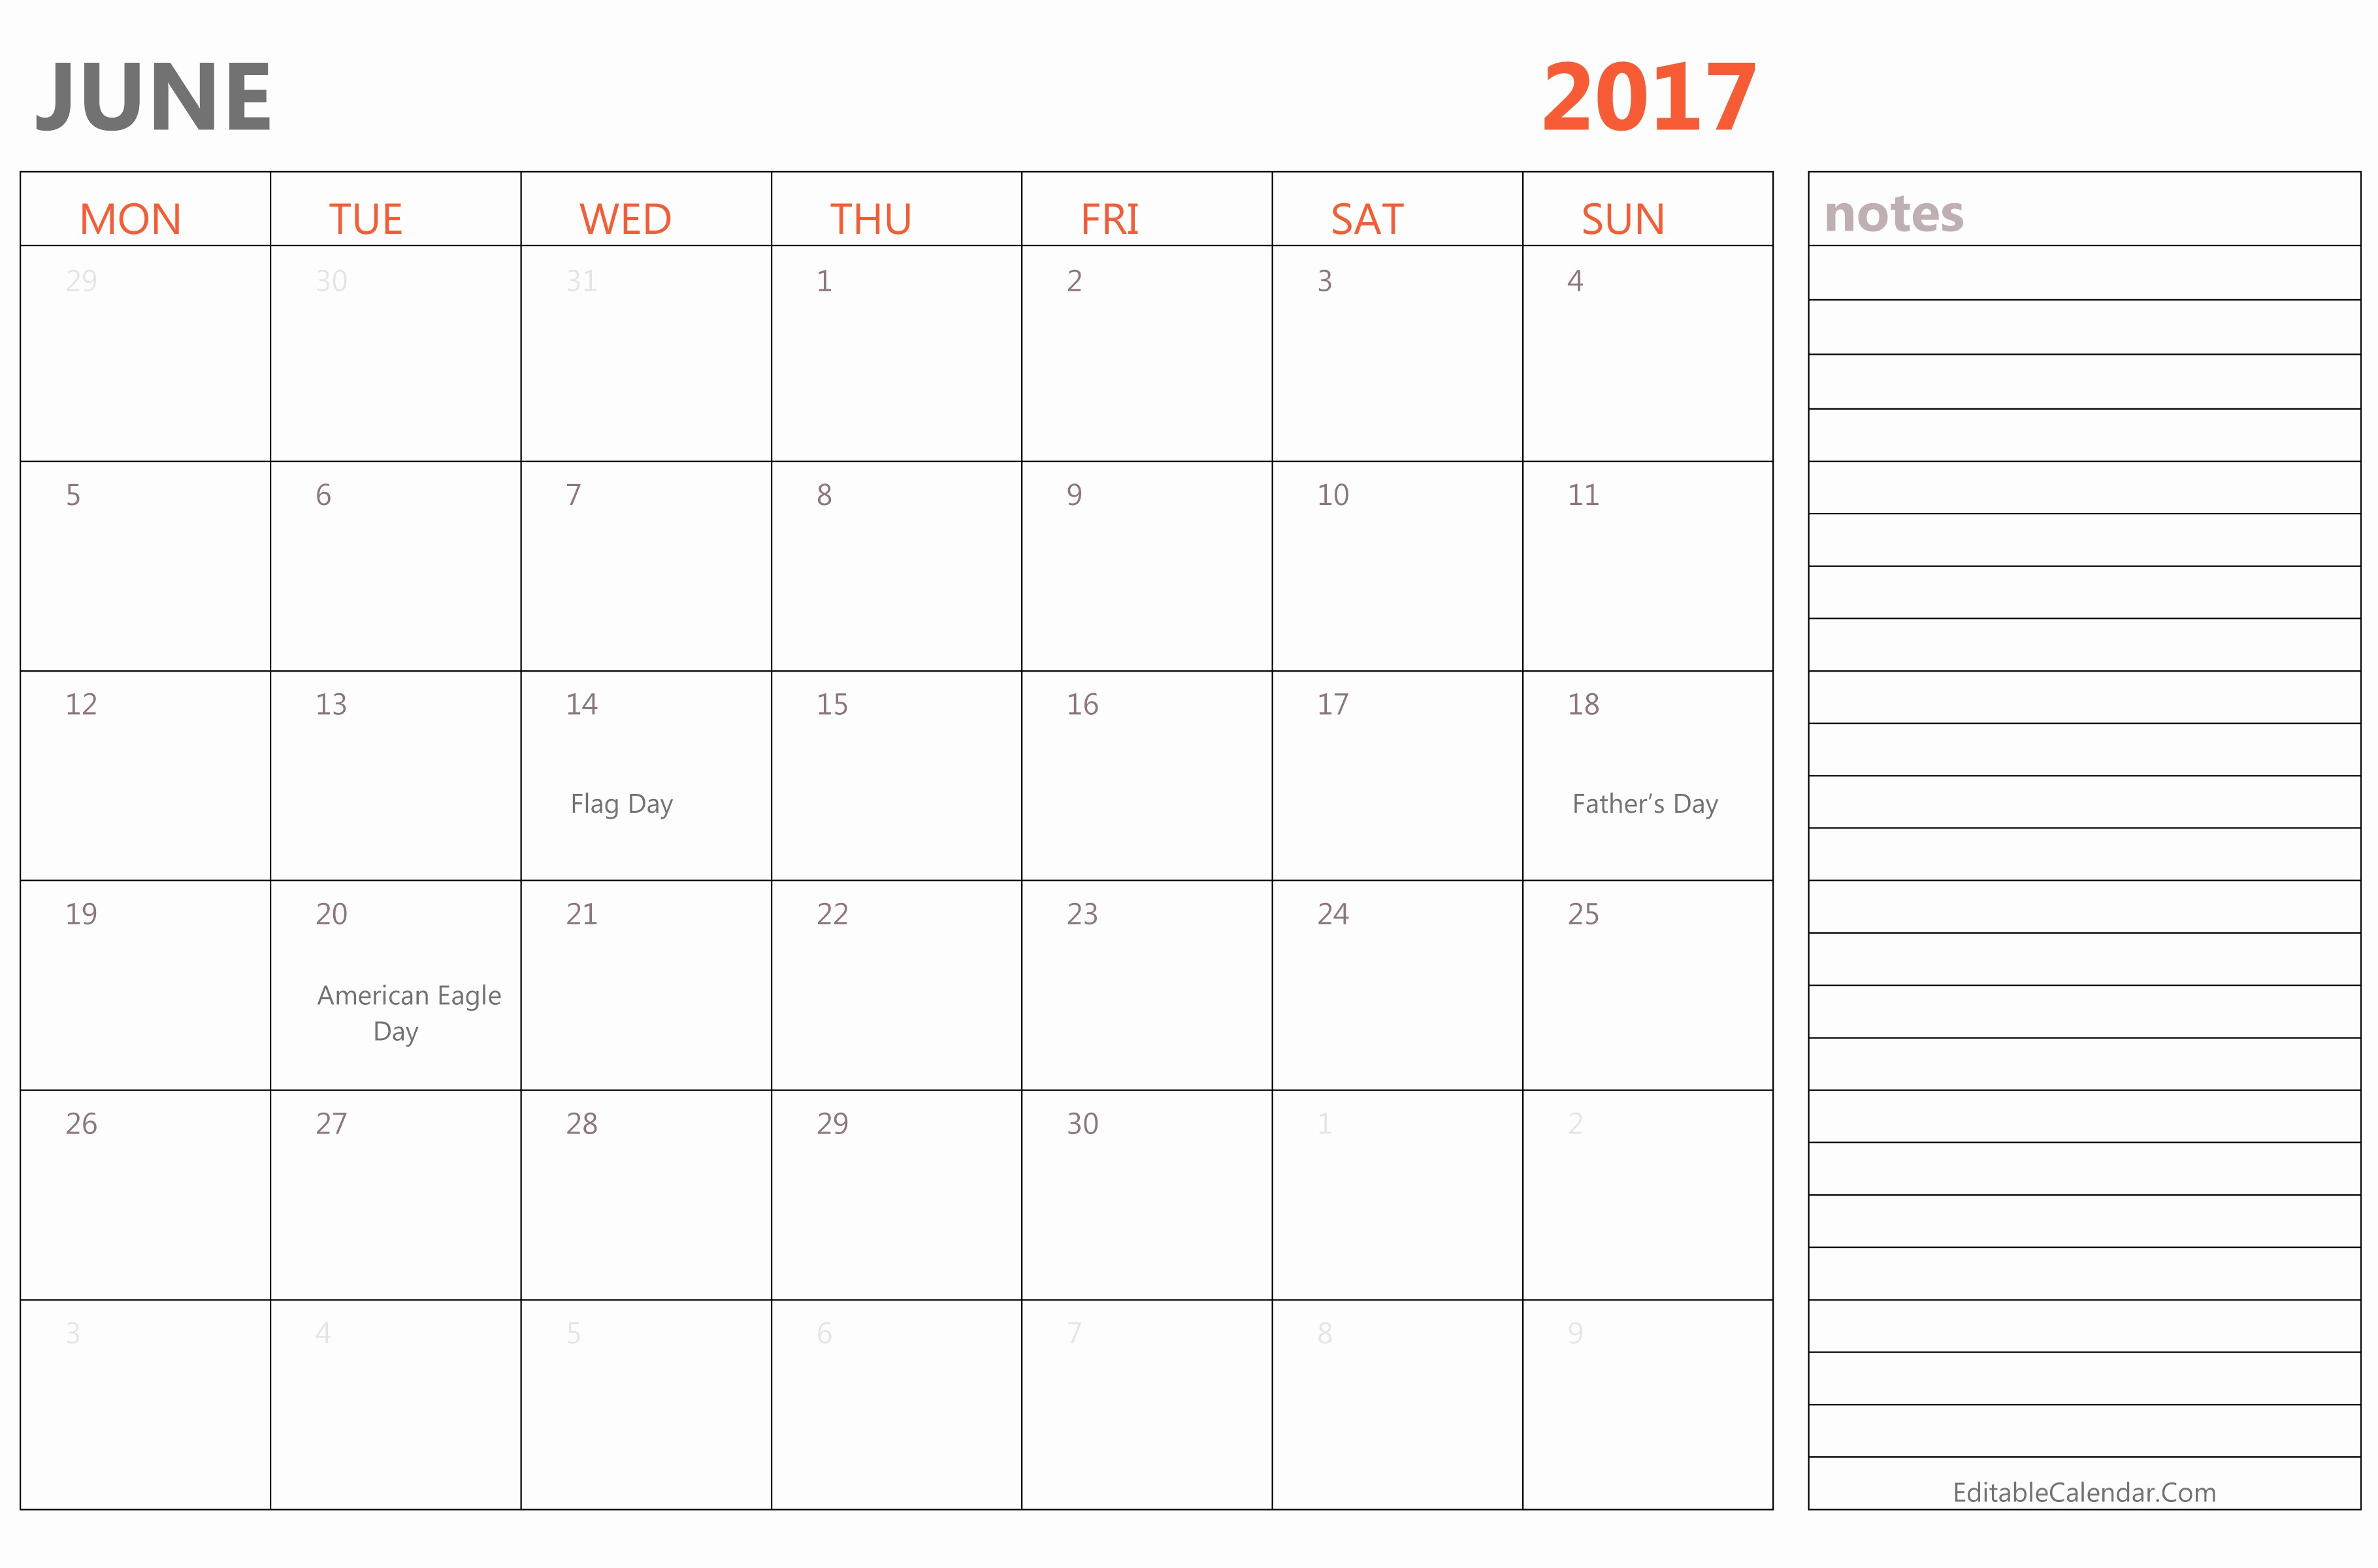 2017 Editable Calendar with Holidays Best Of Editable June 2017 Calendar Template Ms Word Pdf